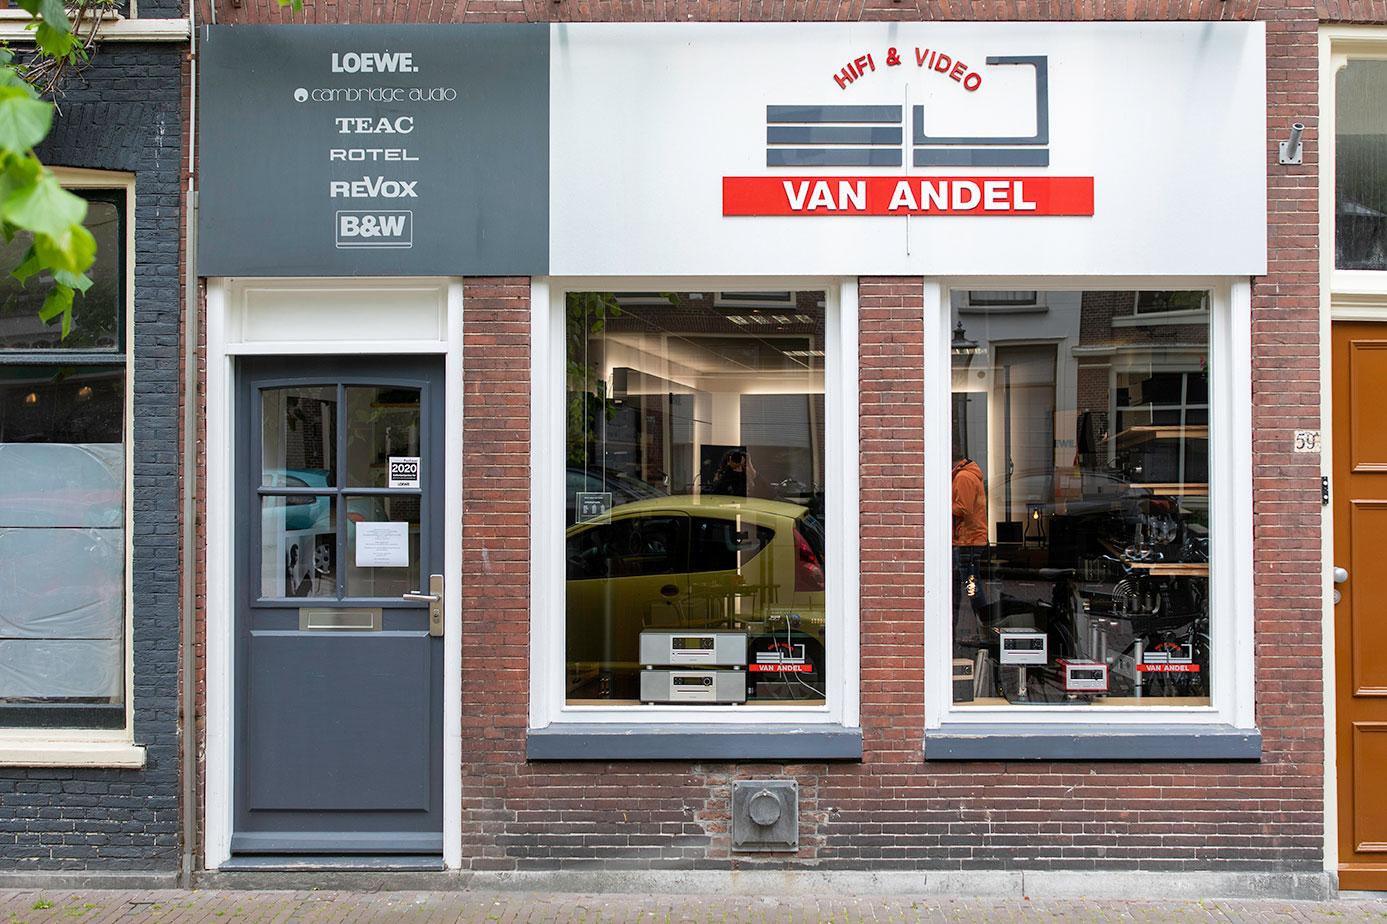 Hifi & Video Van Andel